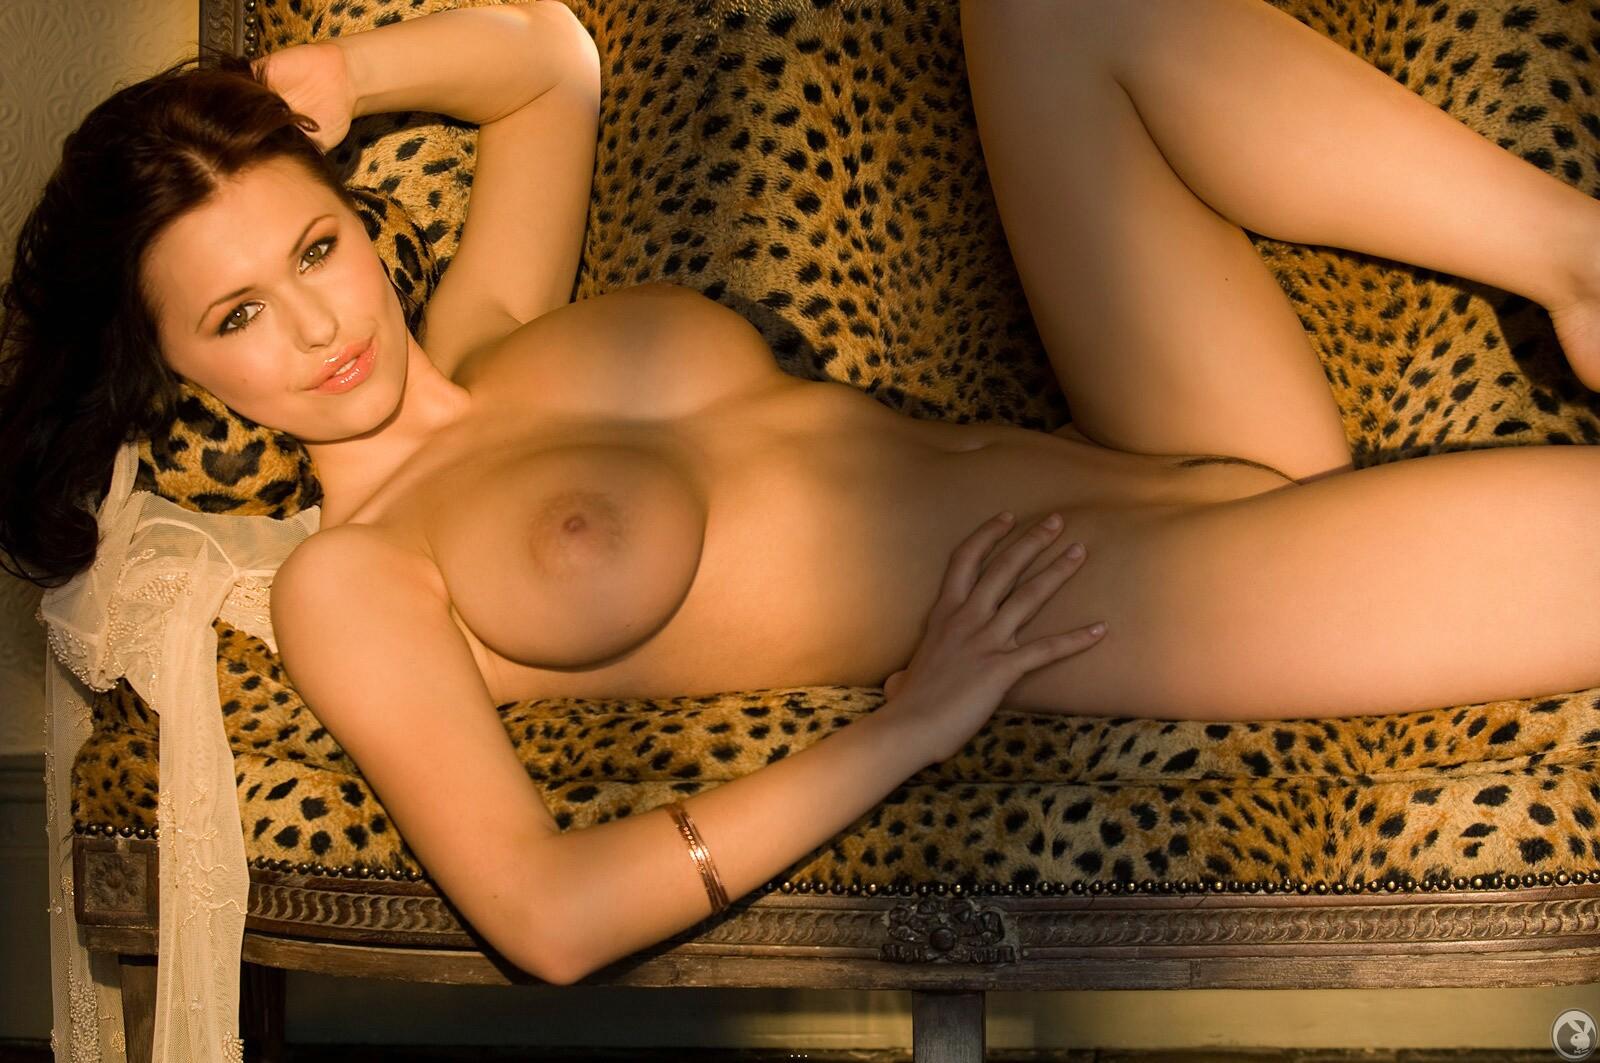 alison waite nude pics